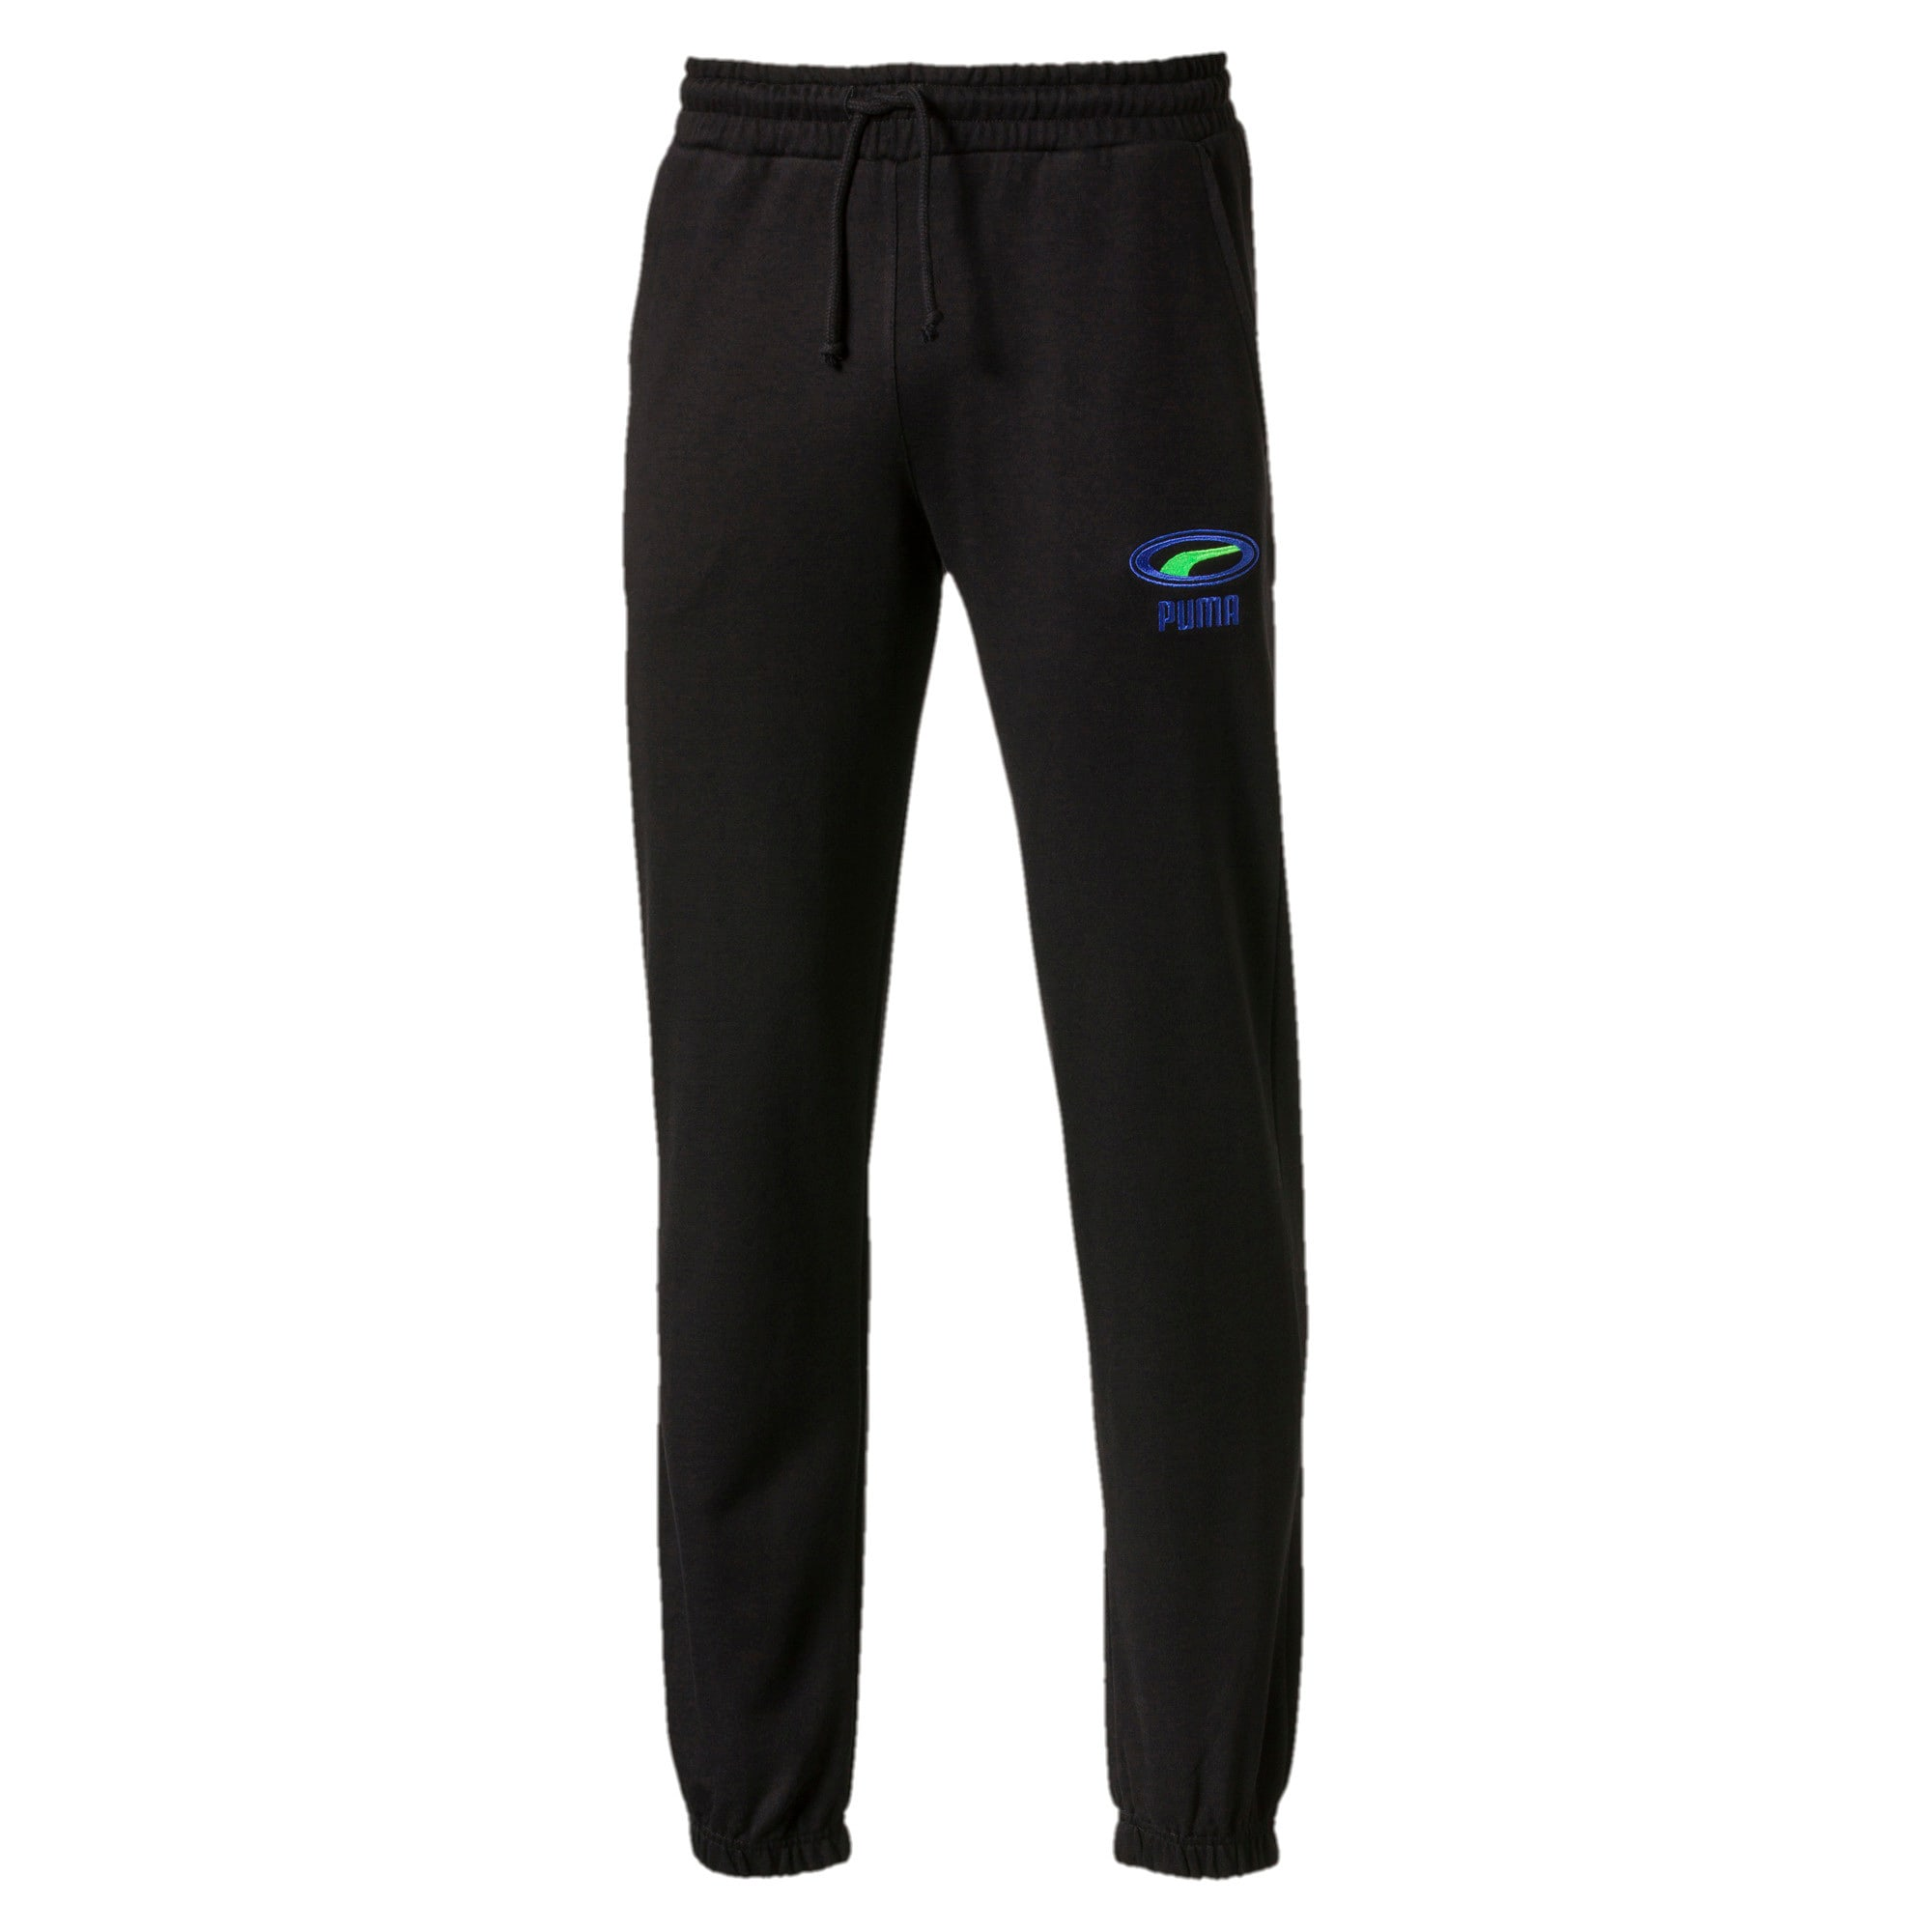 Thumbnail 1 of OG Men's Cuffed Pants, Puma Black, medium